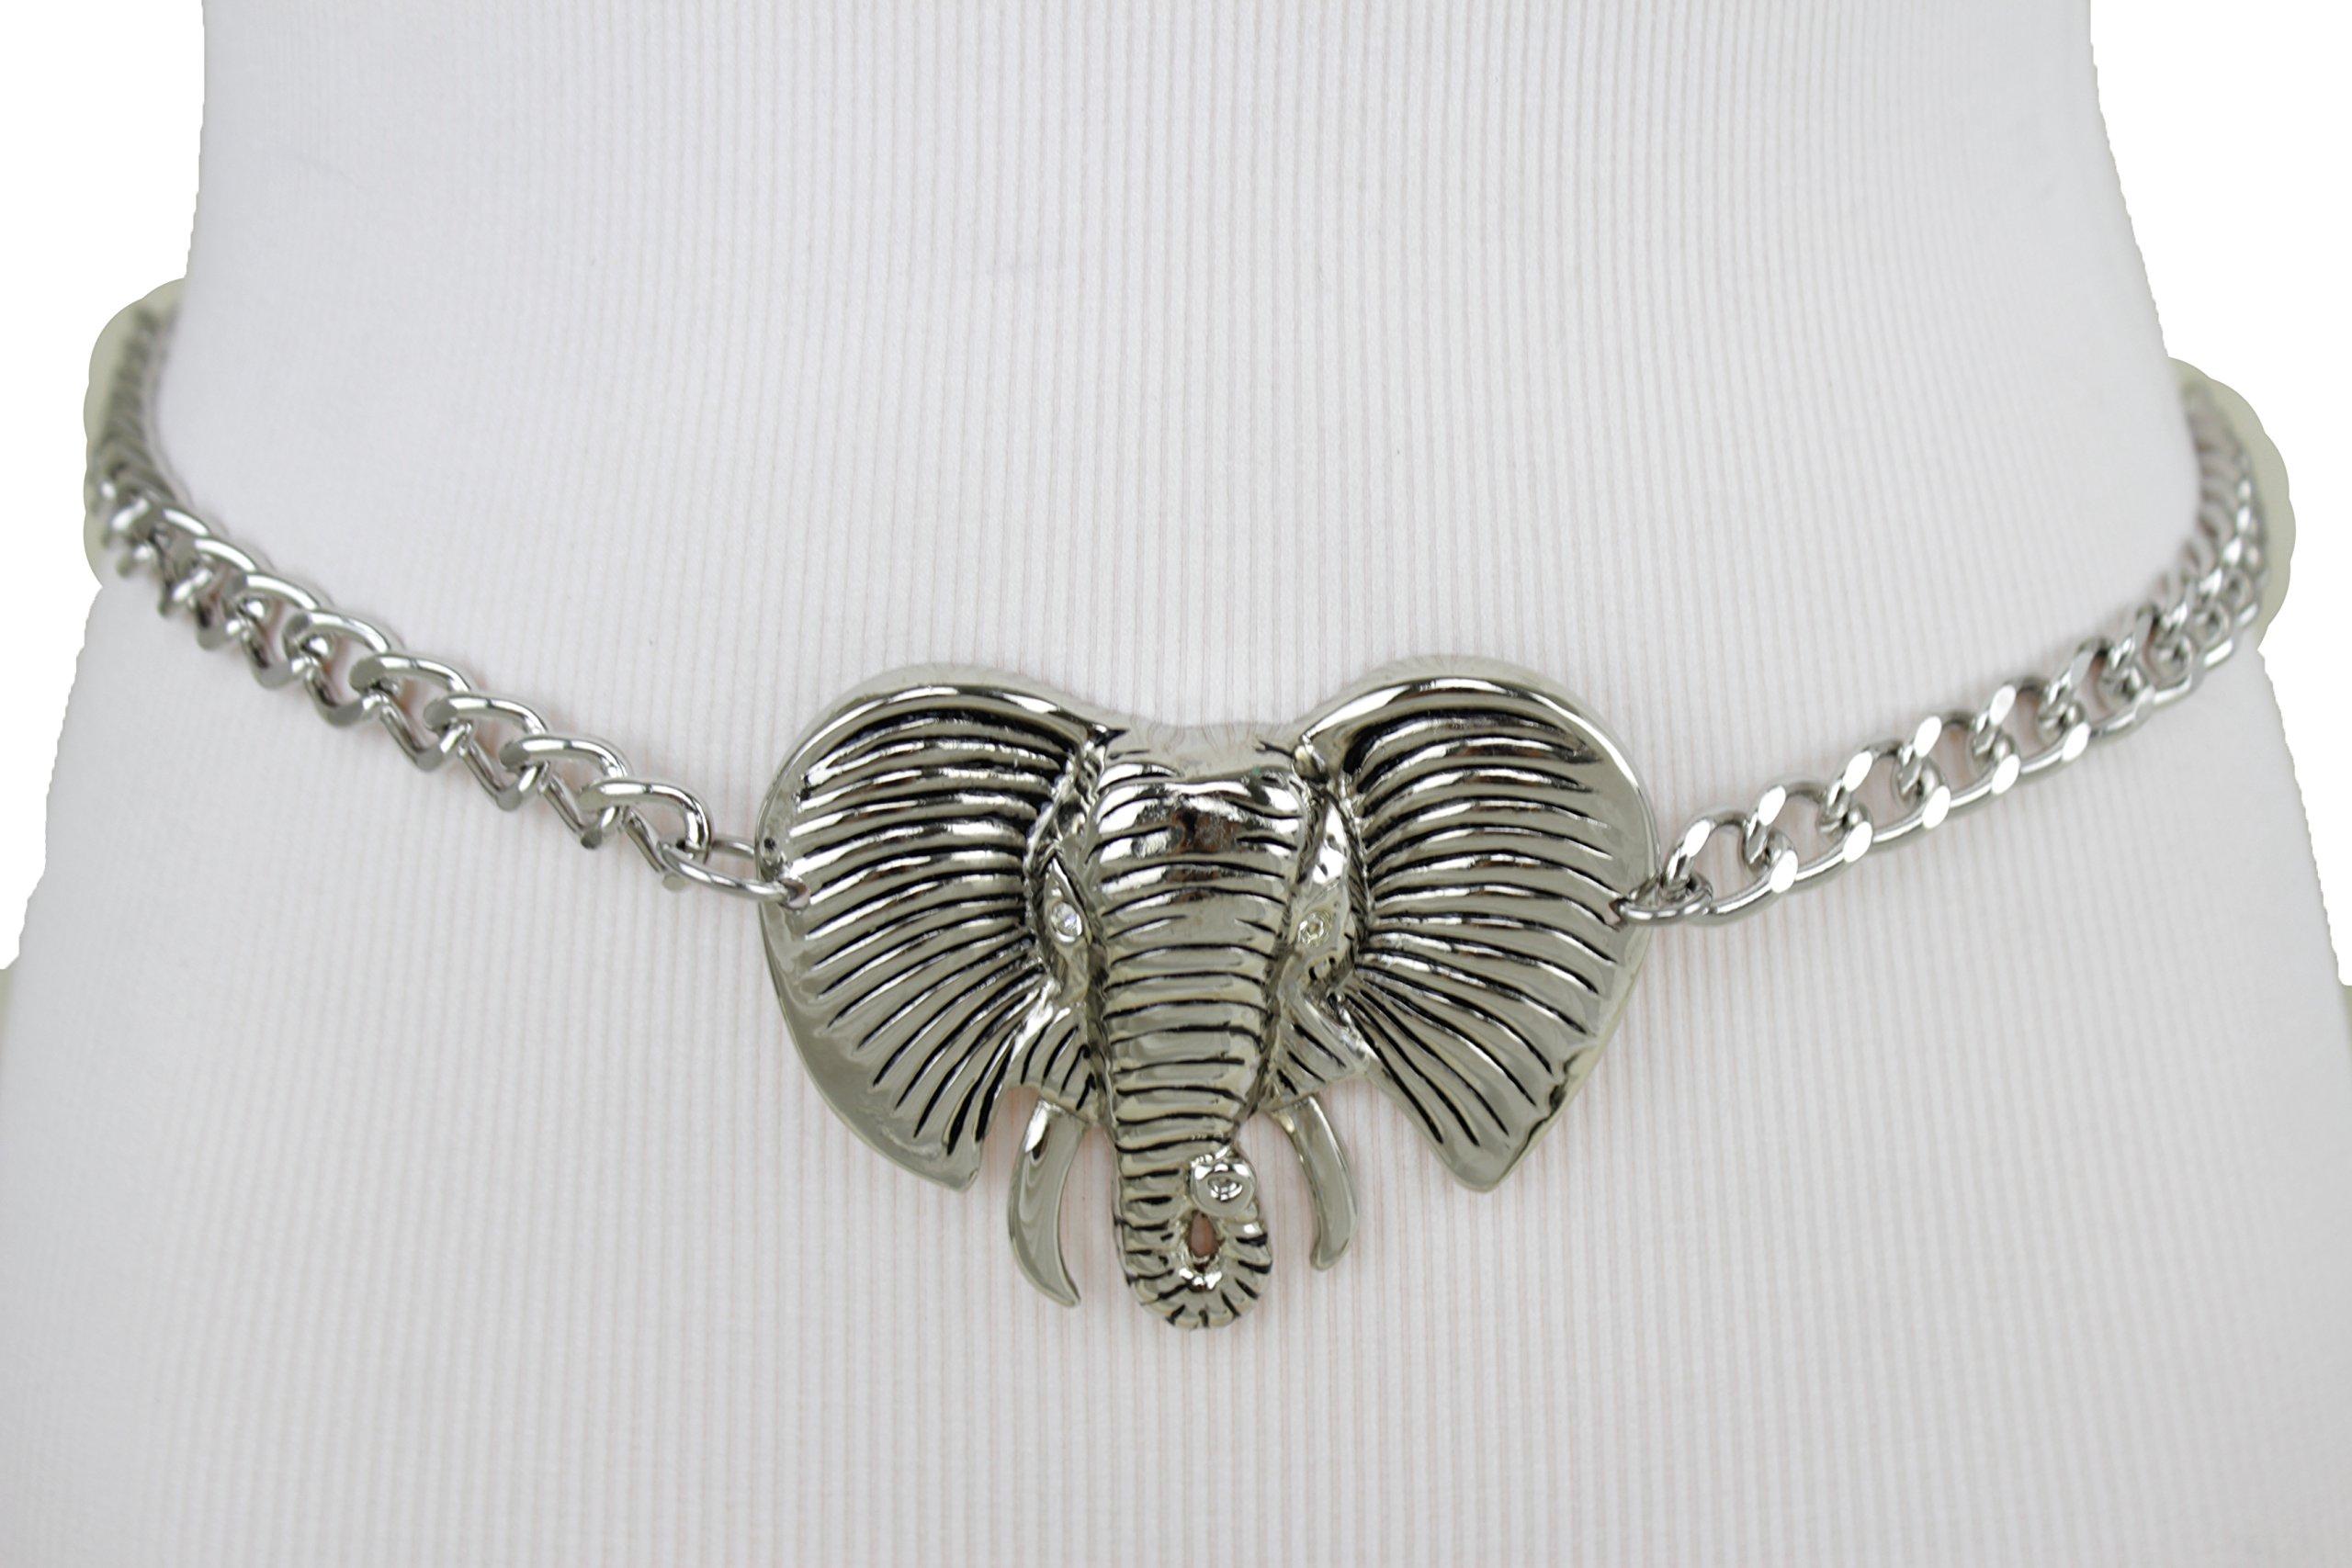 TFJ Women Belt Silver Metal Chain Links Hip High Waist Elephant Buckle Plus M L XL